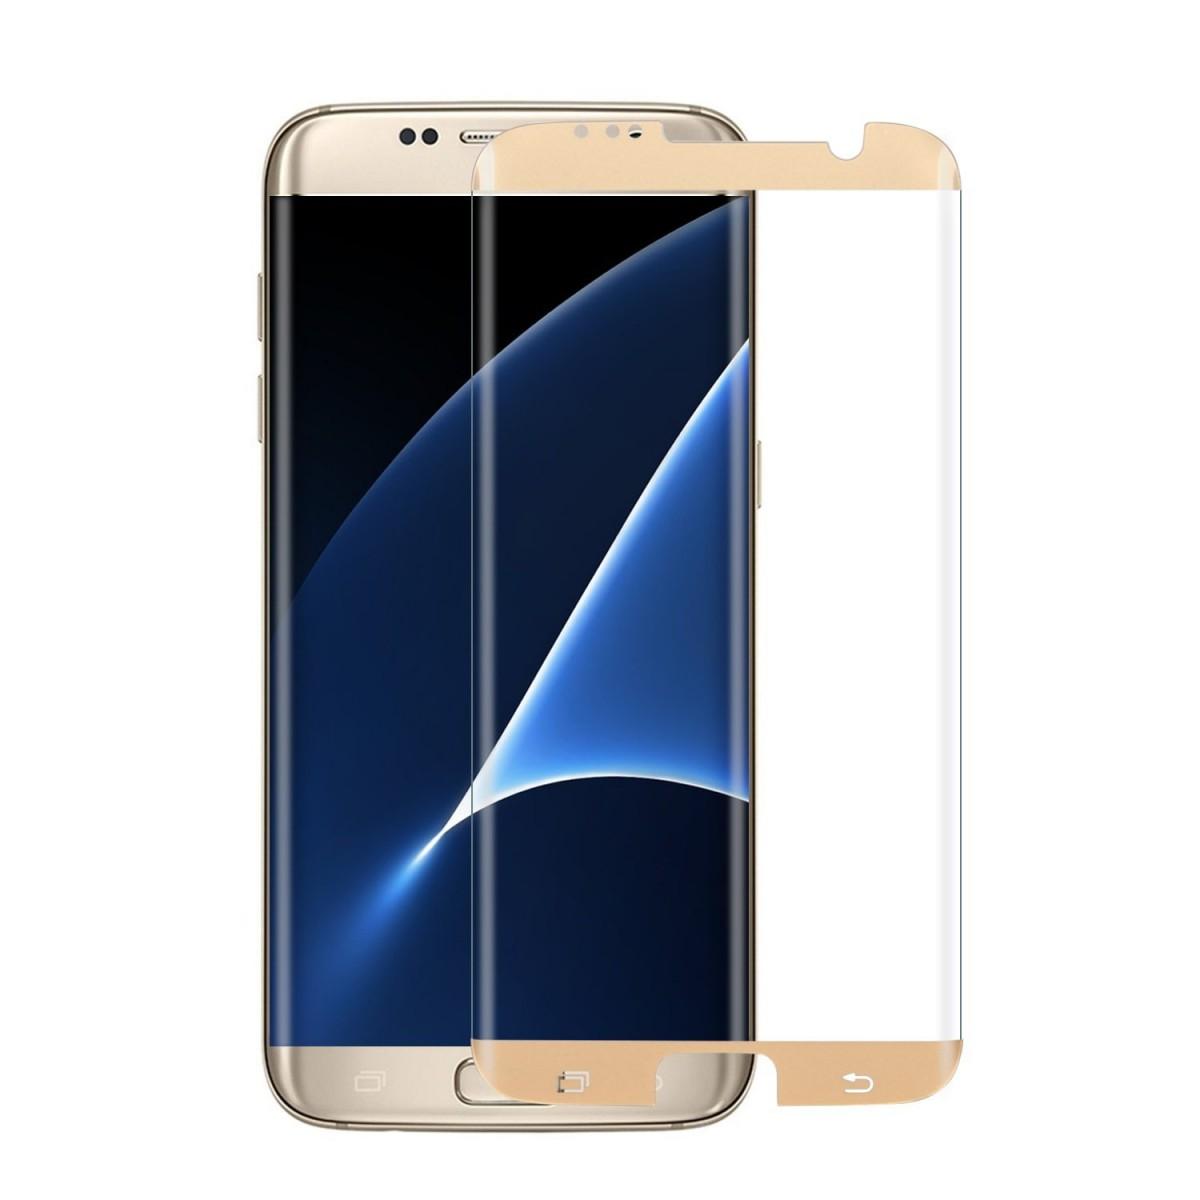 Qoltec tvrzené ochranné sklo premium pro smartphony Sam.S7 edge |full cover|gold 51334